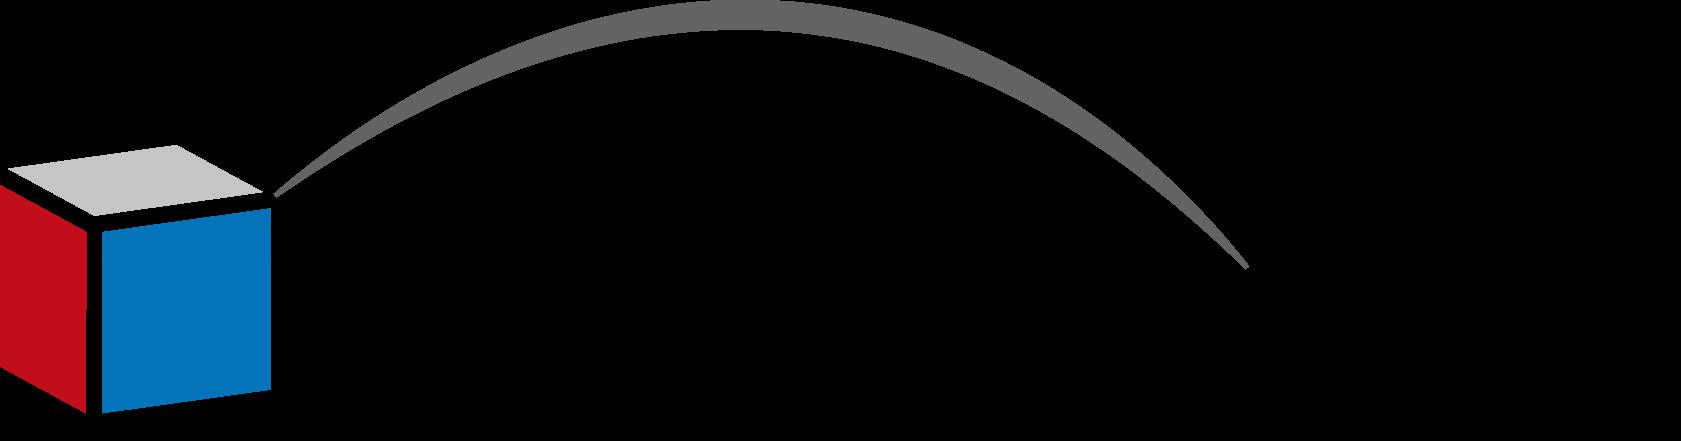 Paul Wurth Incub Logo C-transparent-new to add